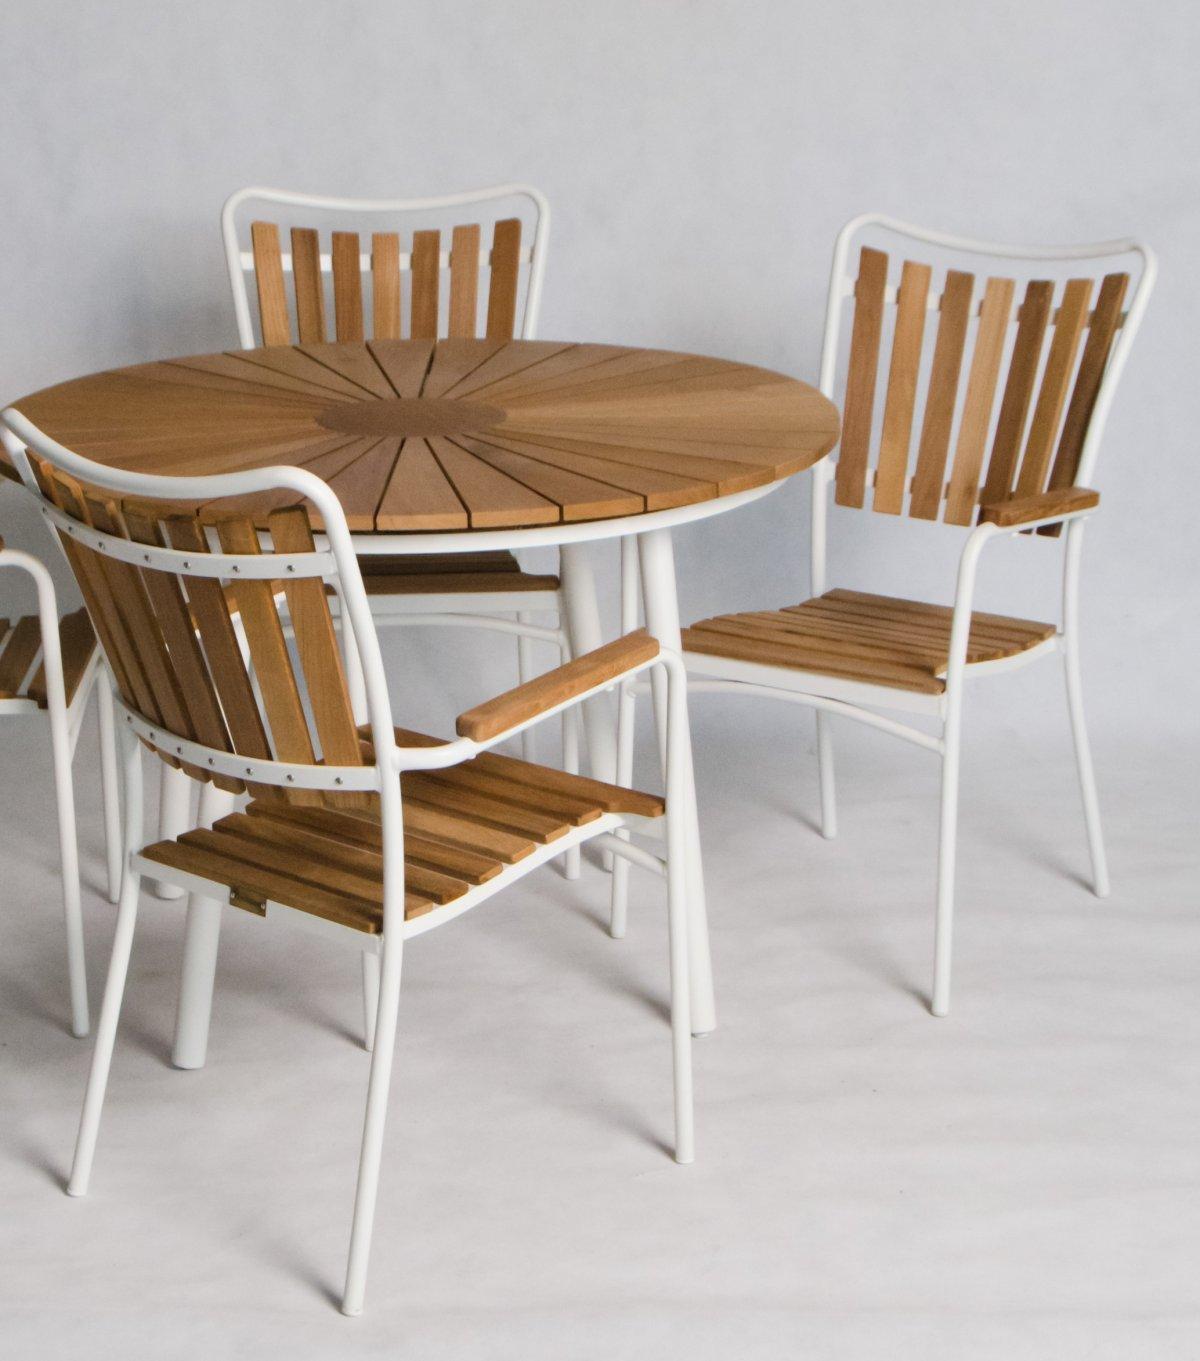 danish design re produced 1950s retro outdoor furniture new rh bobutik com au danish outdoor furniture nz danish outdoor furniture uk